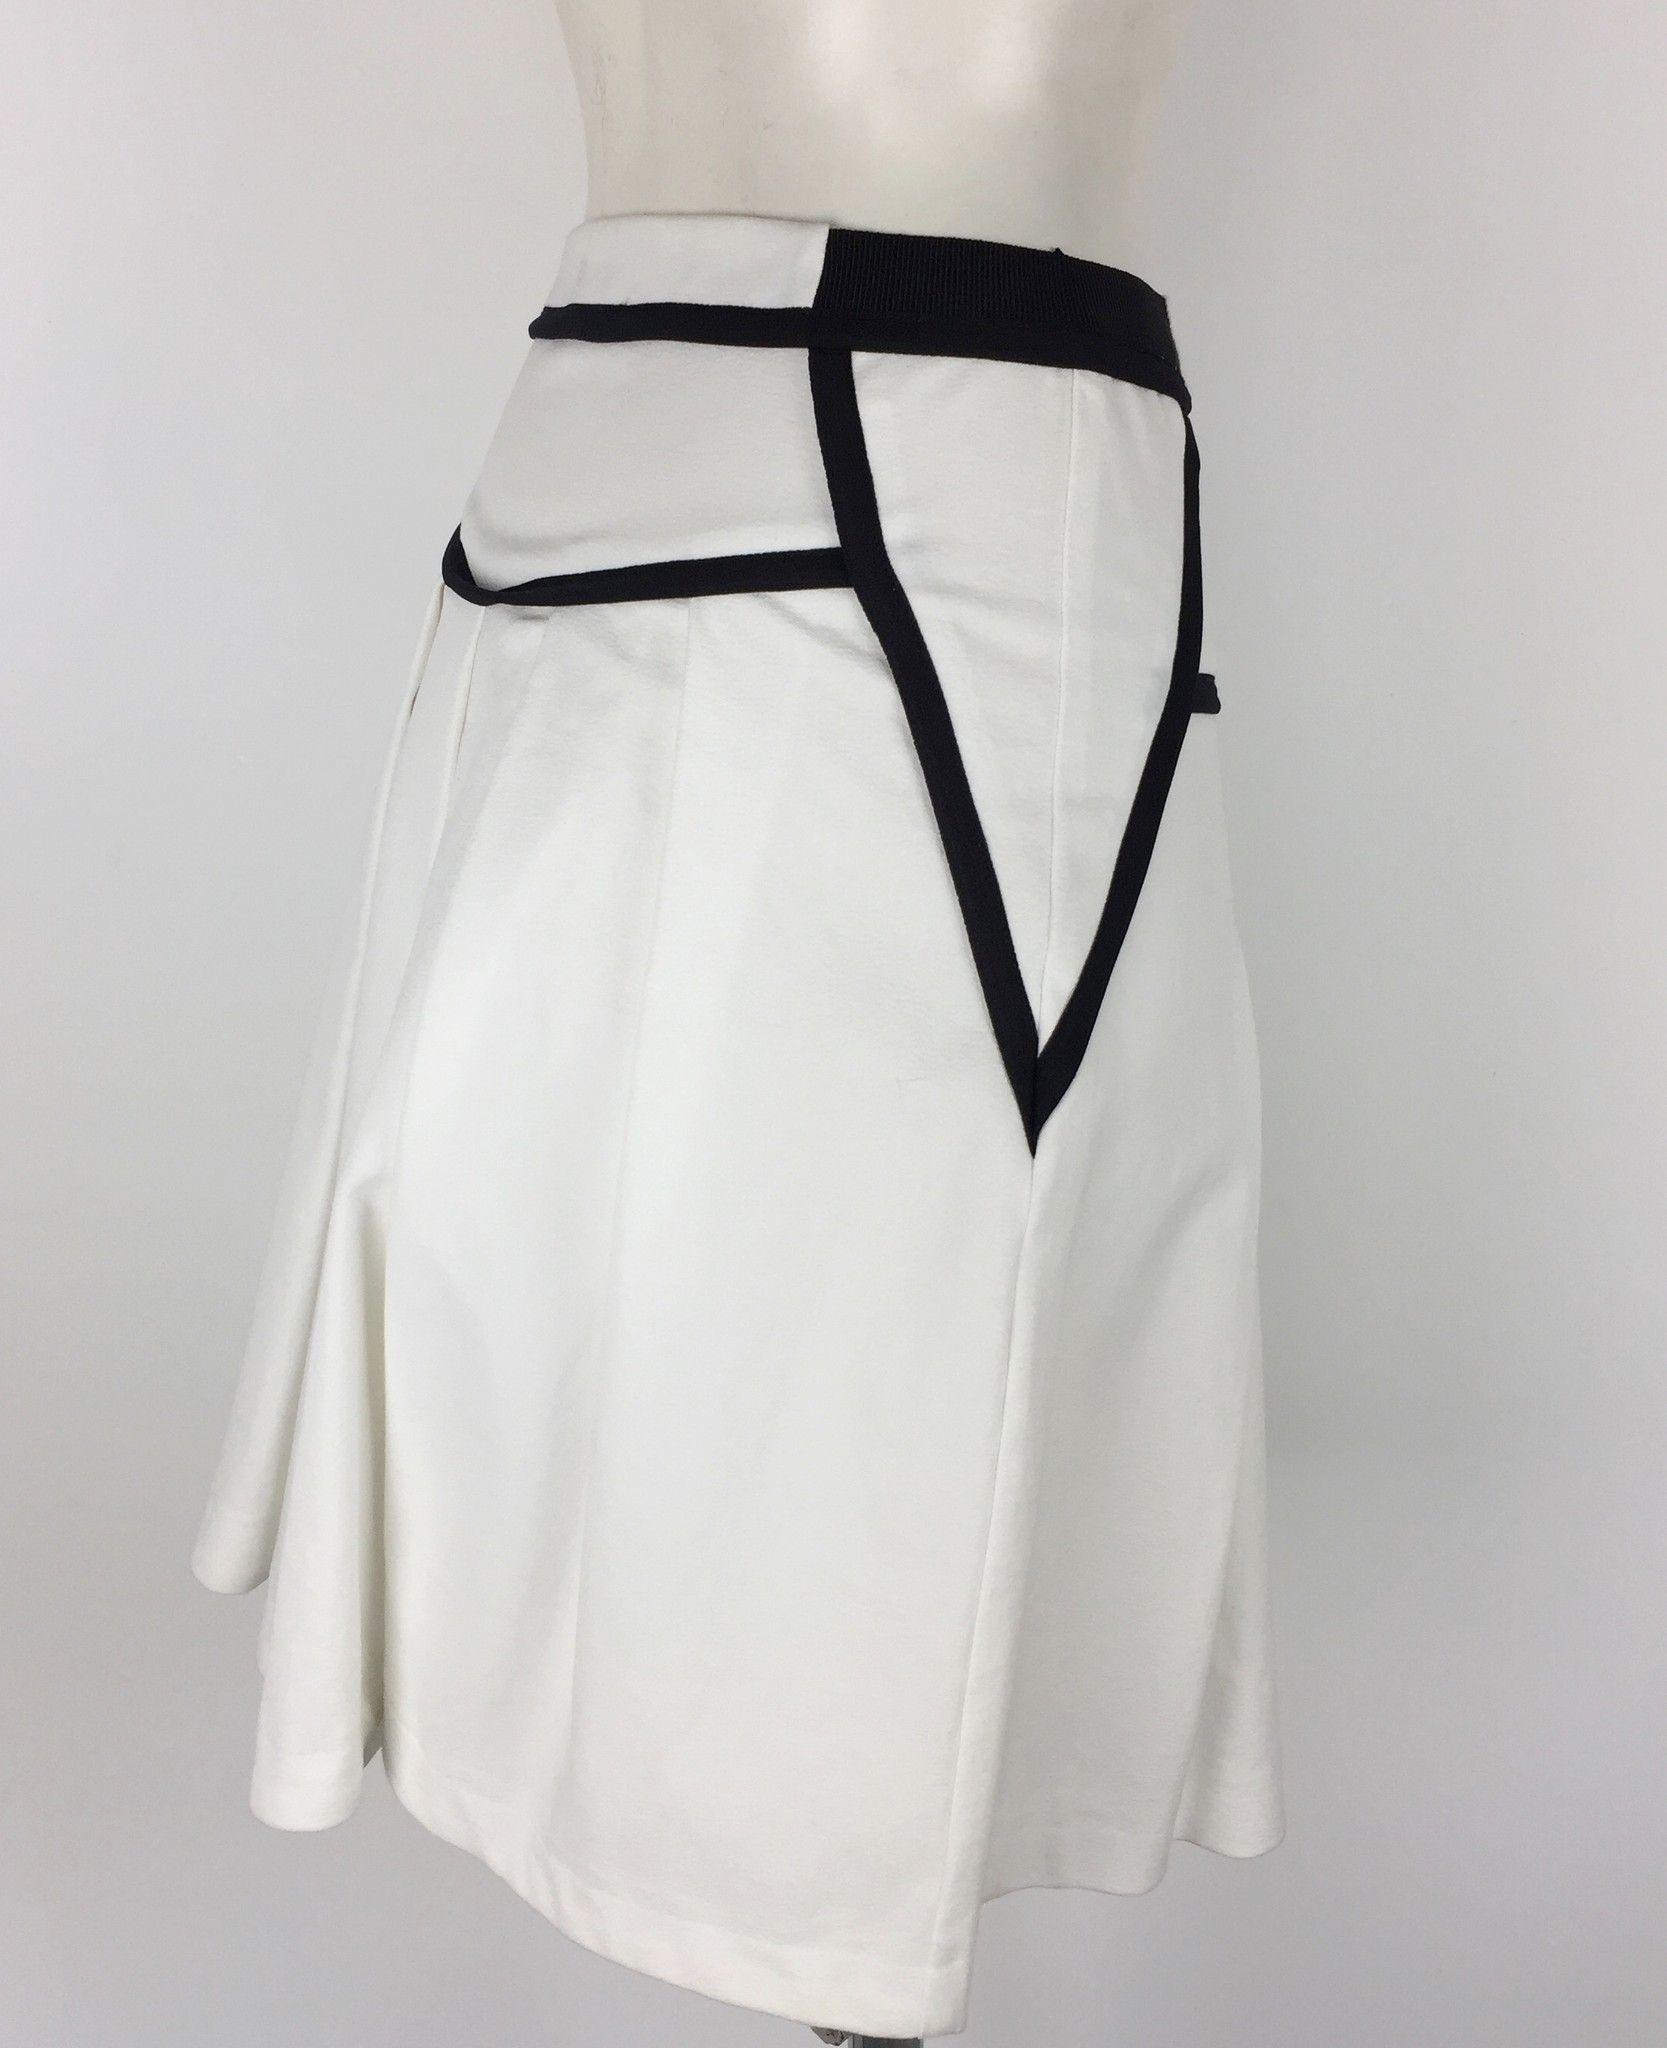 Atos Lombardini Flared Skirt with Black Inserts Cod.TQ1191